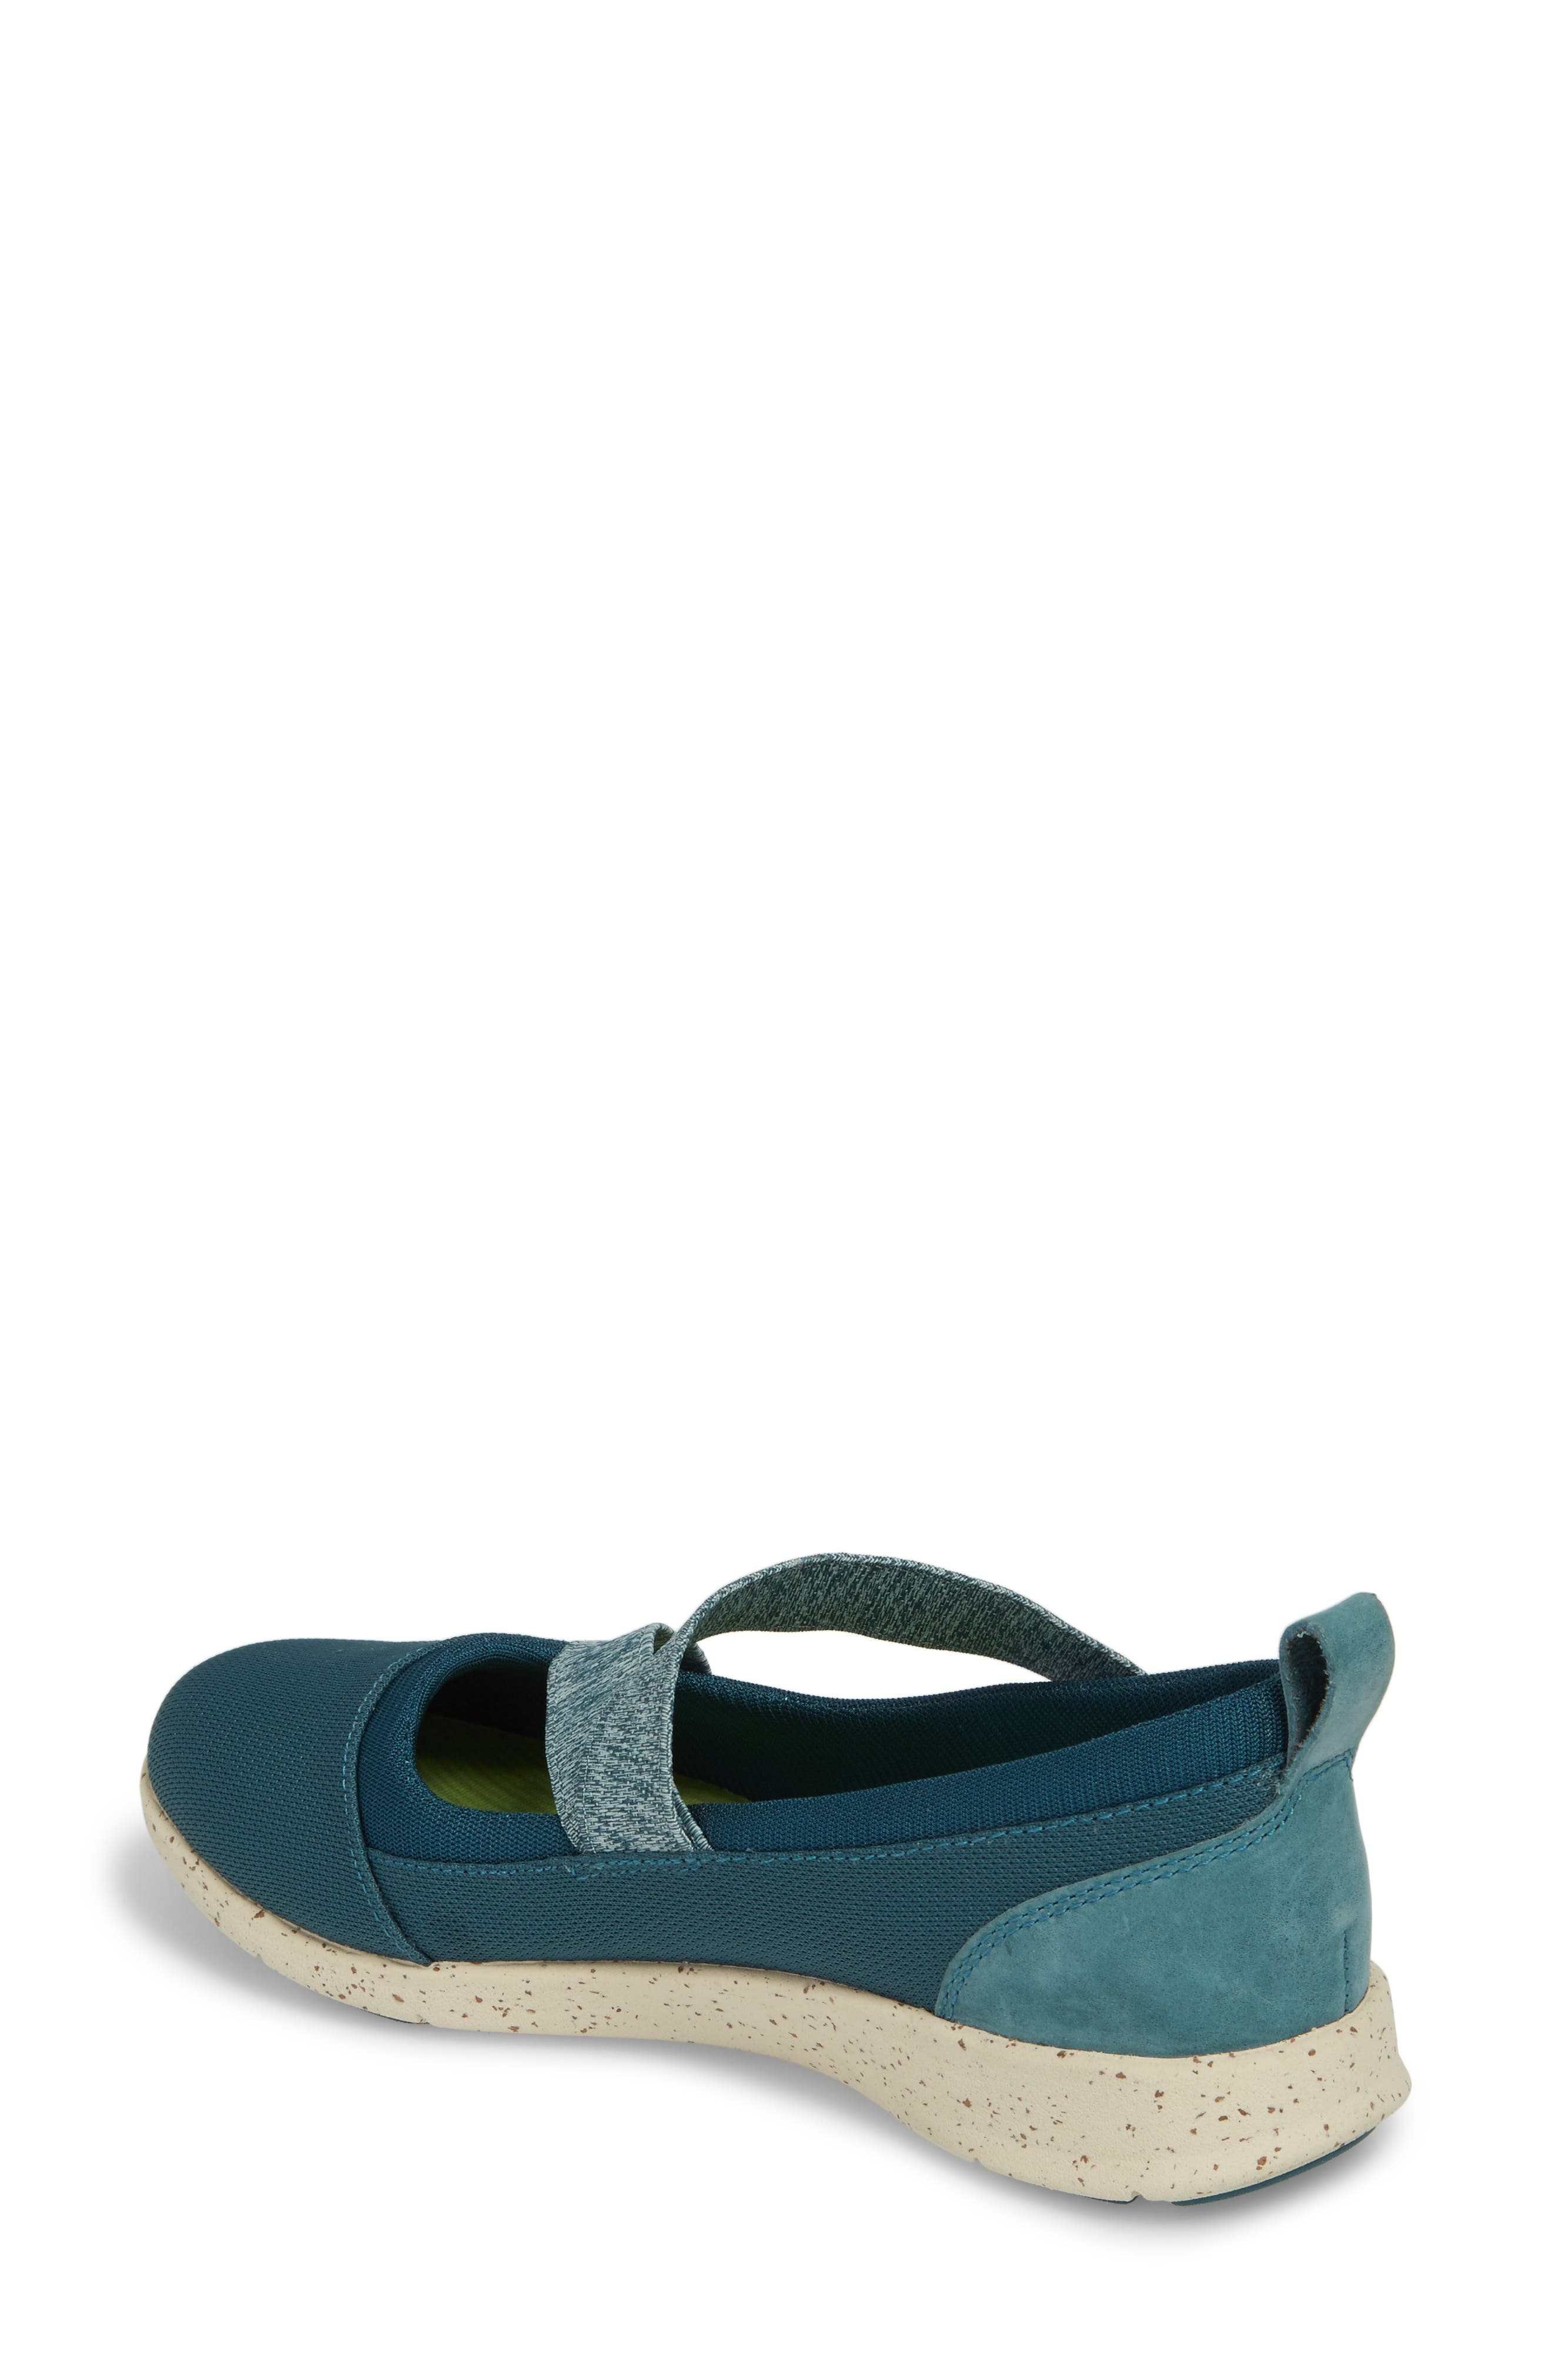 Palisade Sneaker,                             Alternate thumbnail 2, color,                             Balsam Blue Leather